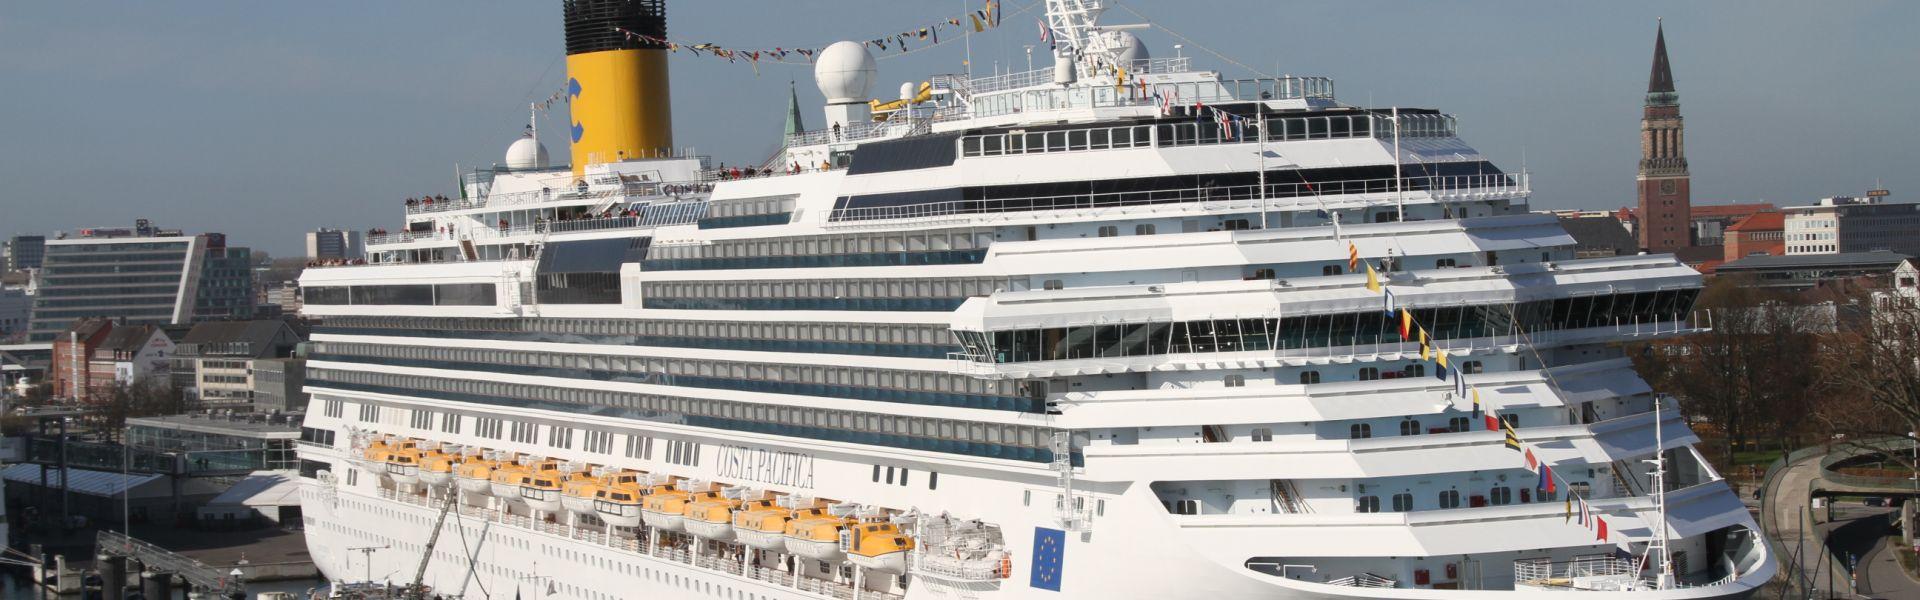 Croaziera 2017 - Capitalele Nordice (Kiel) - Costa Cruises - Costa Pacifica - 11 nopti